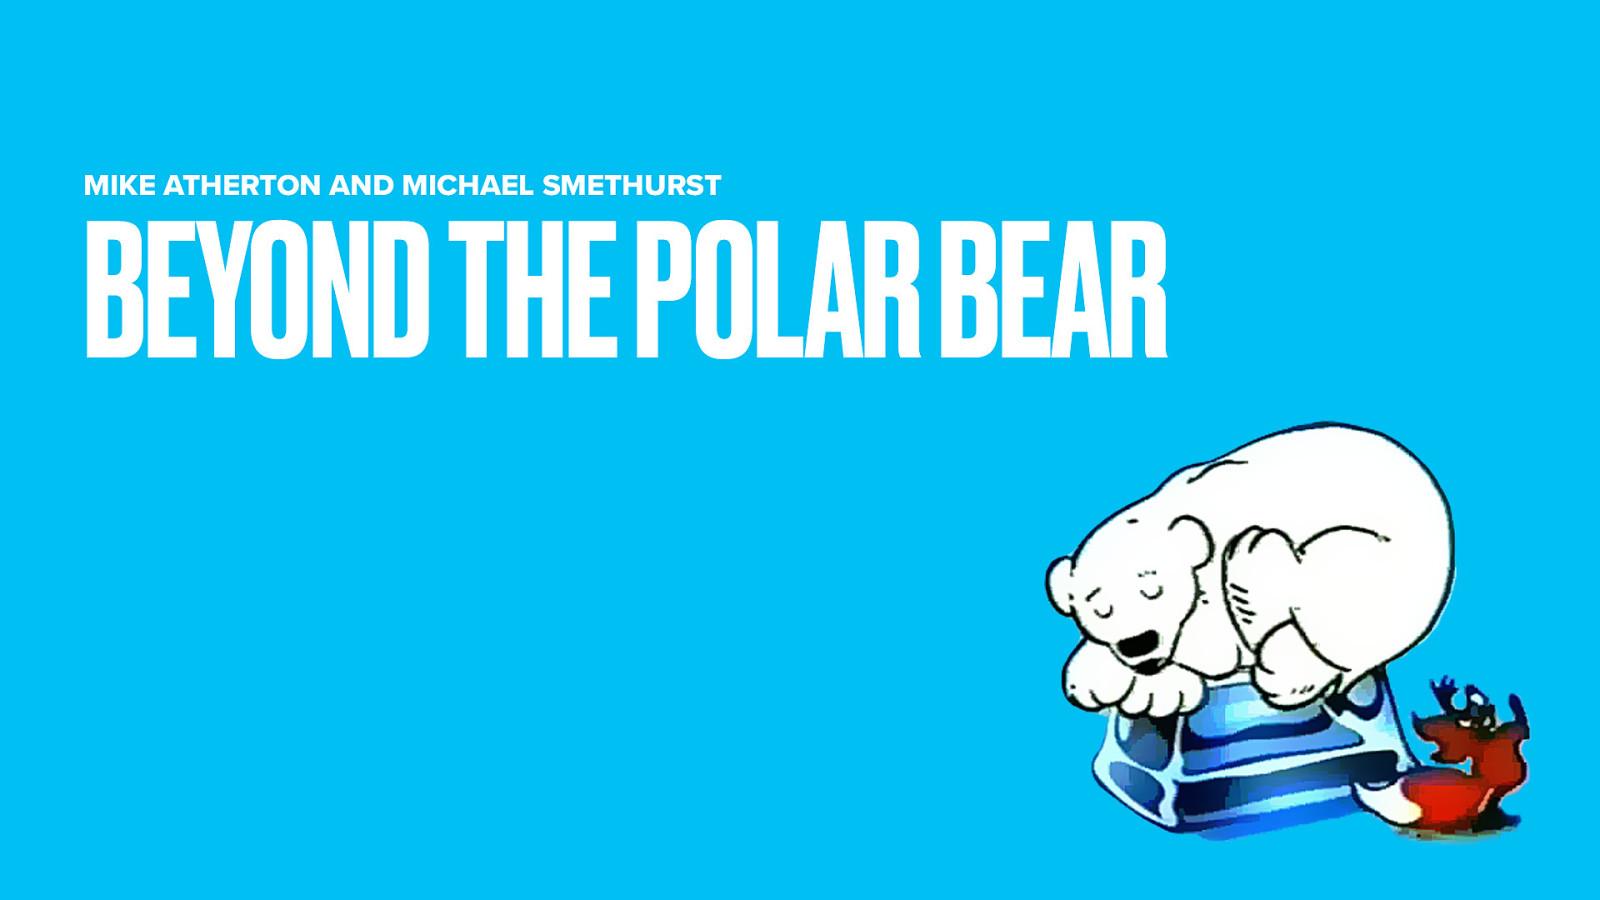 Beyond the Polar Bear (2020 Remaster)